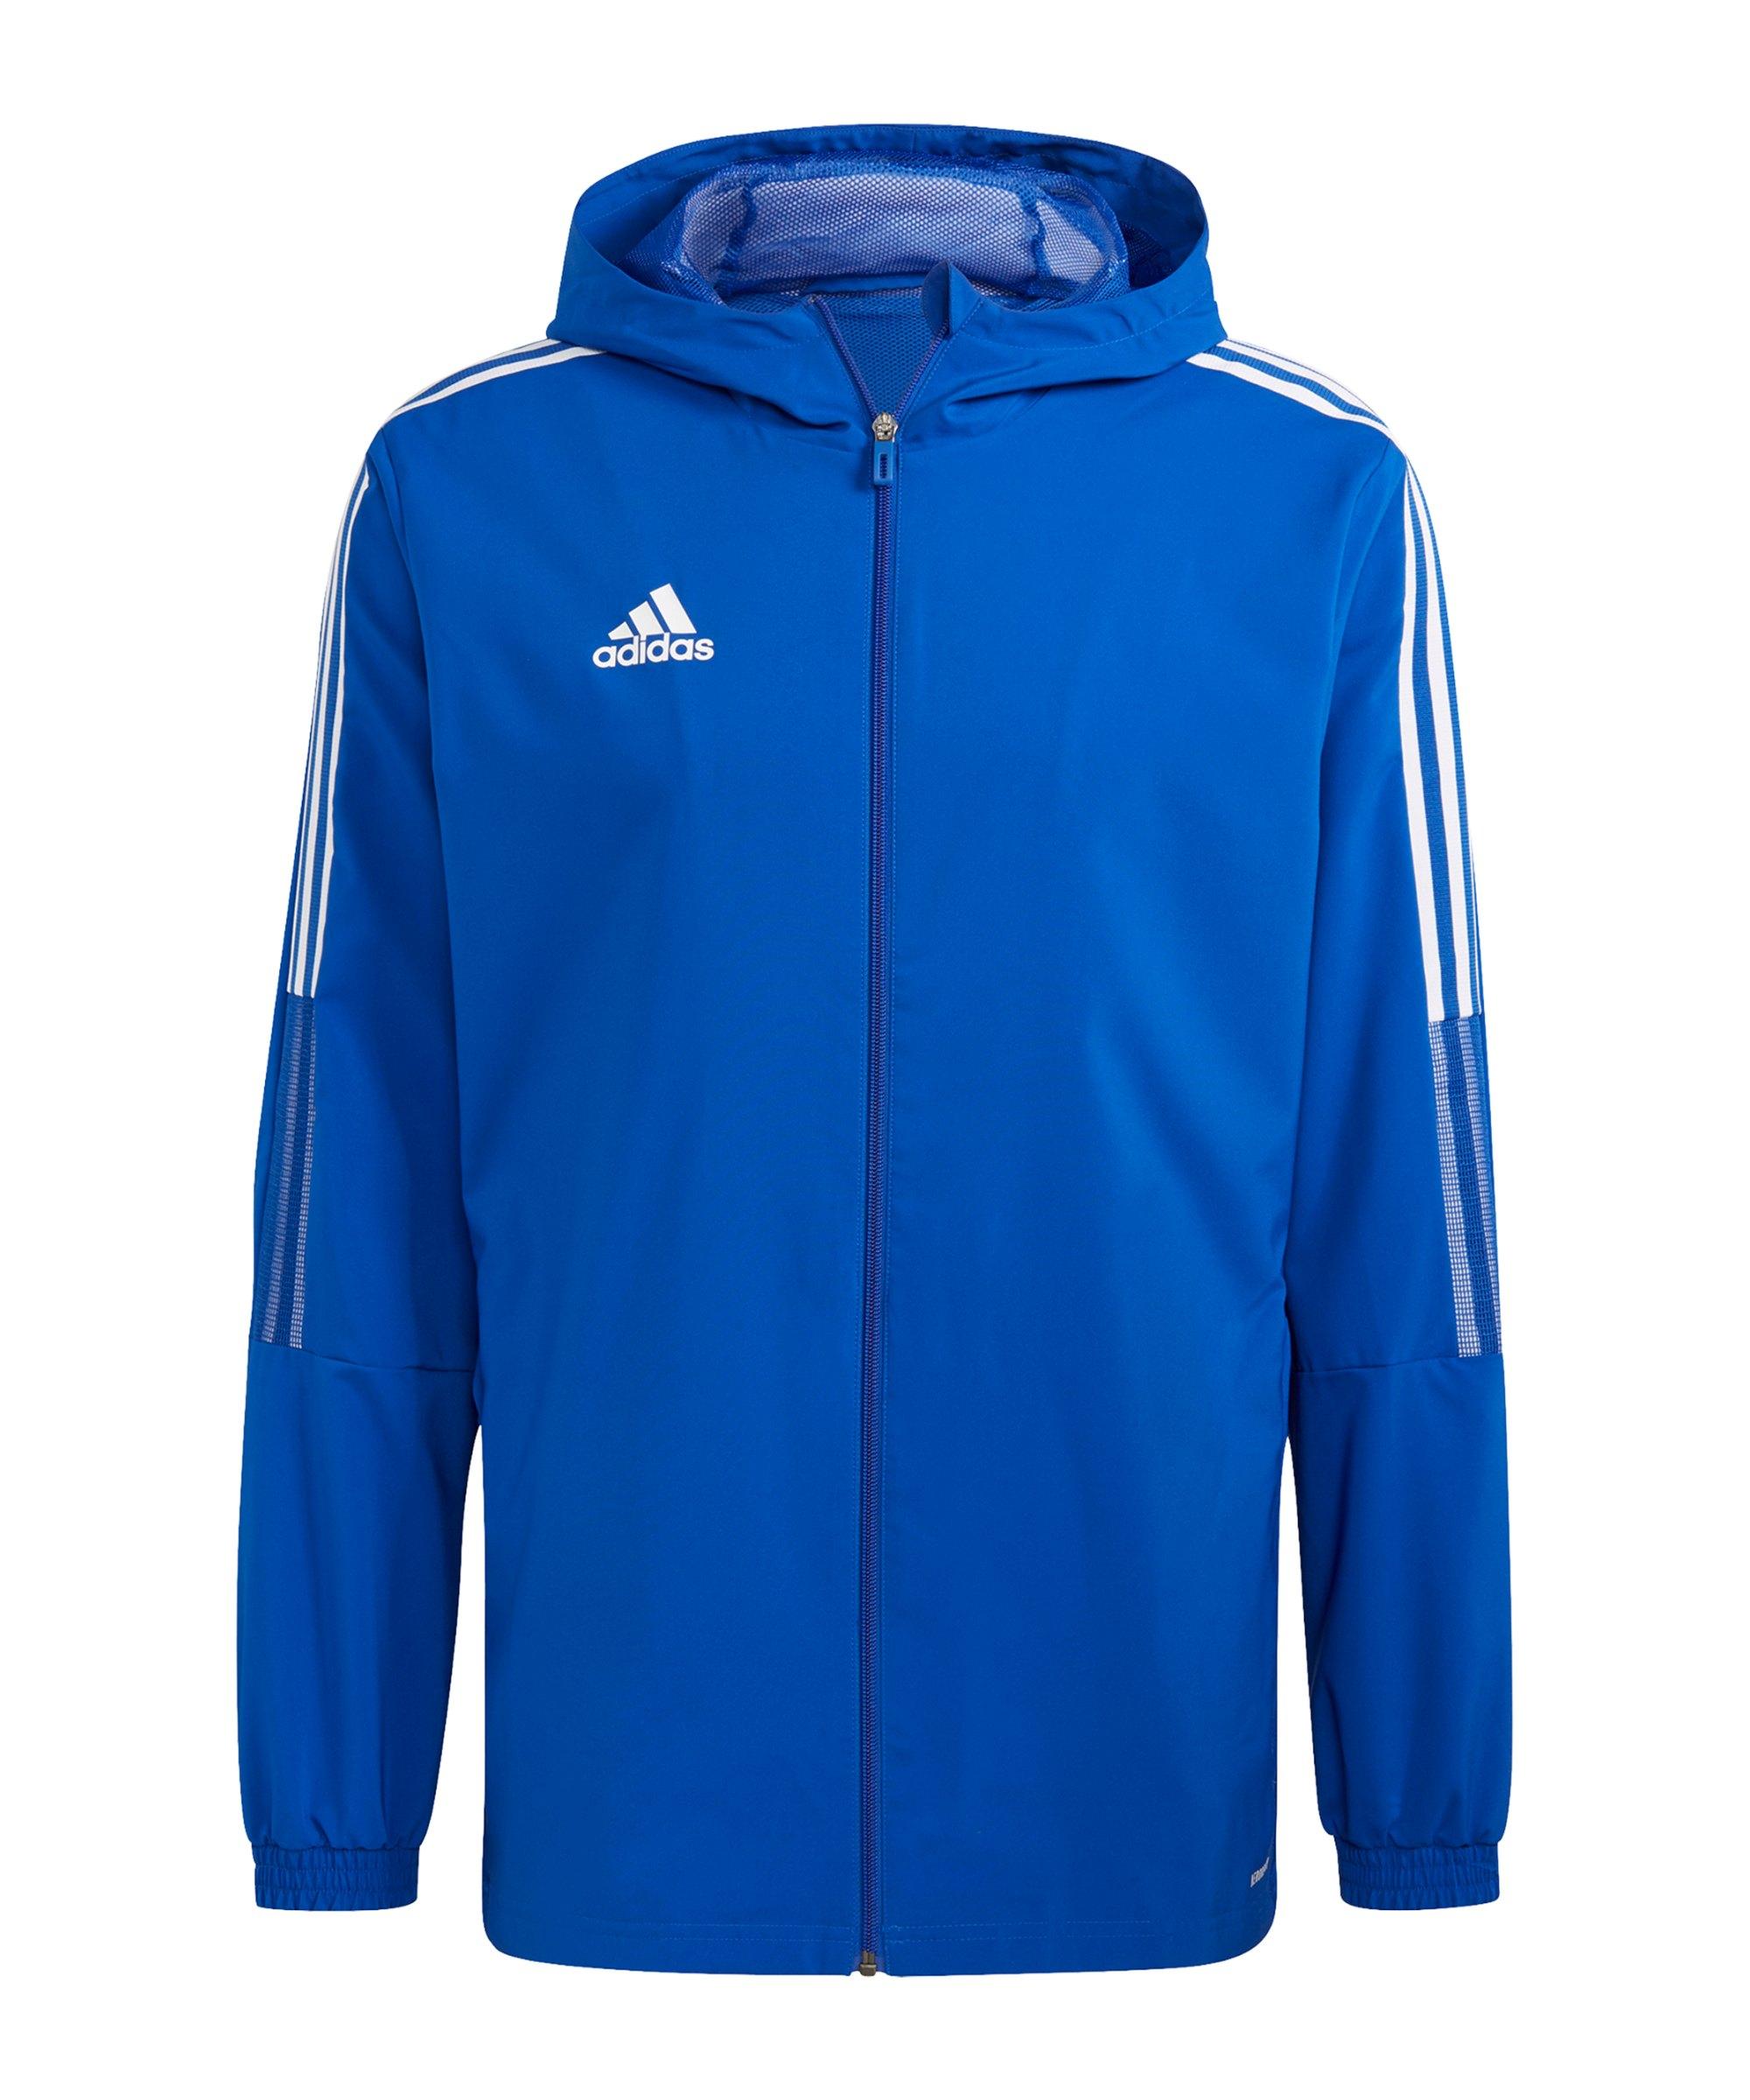 adidas Tiro 21 Windbreaker Blau - blau